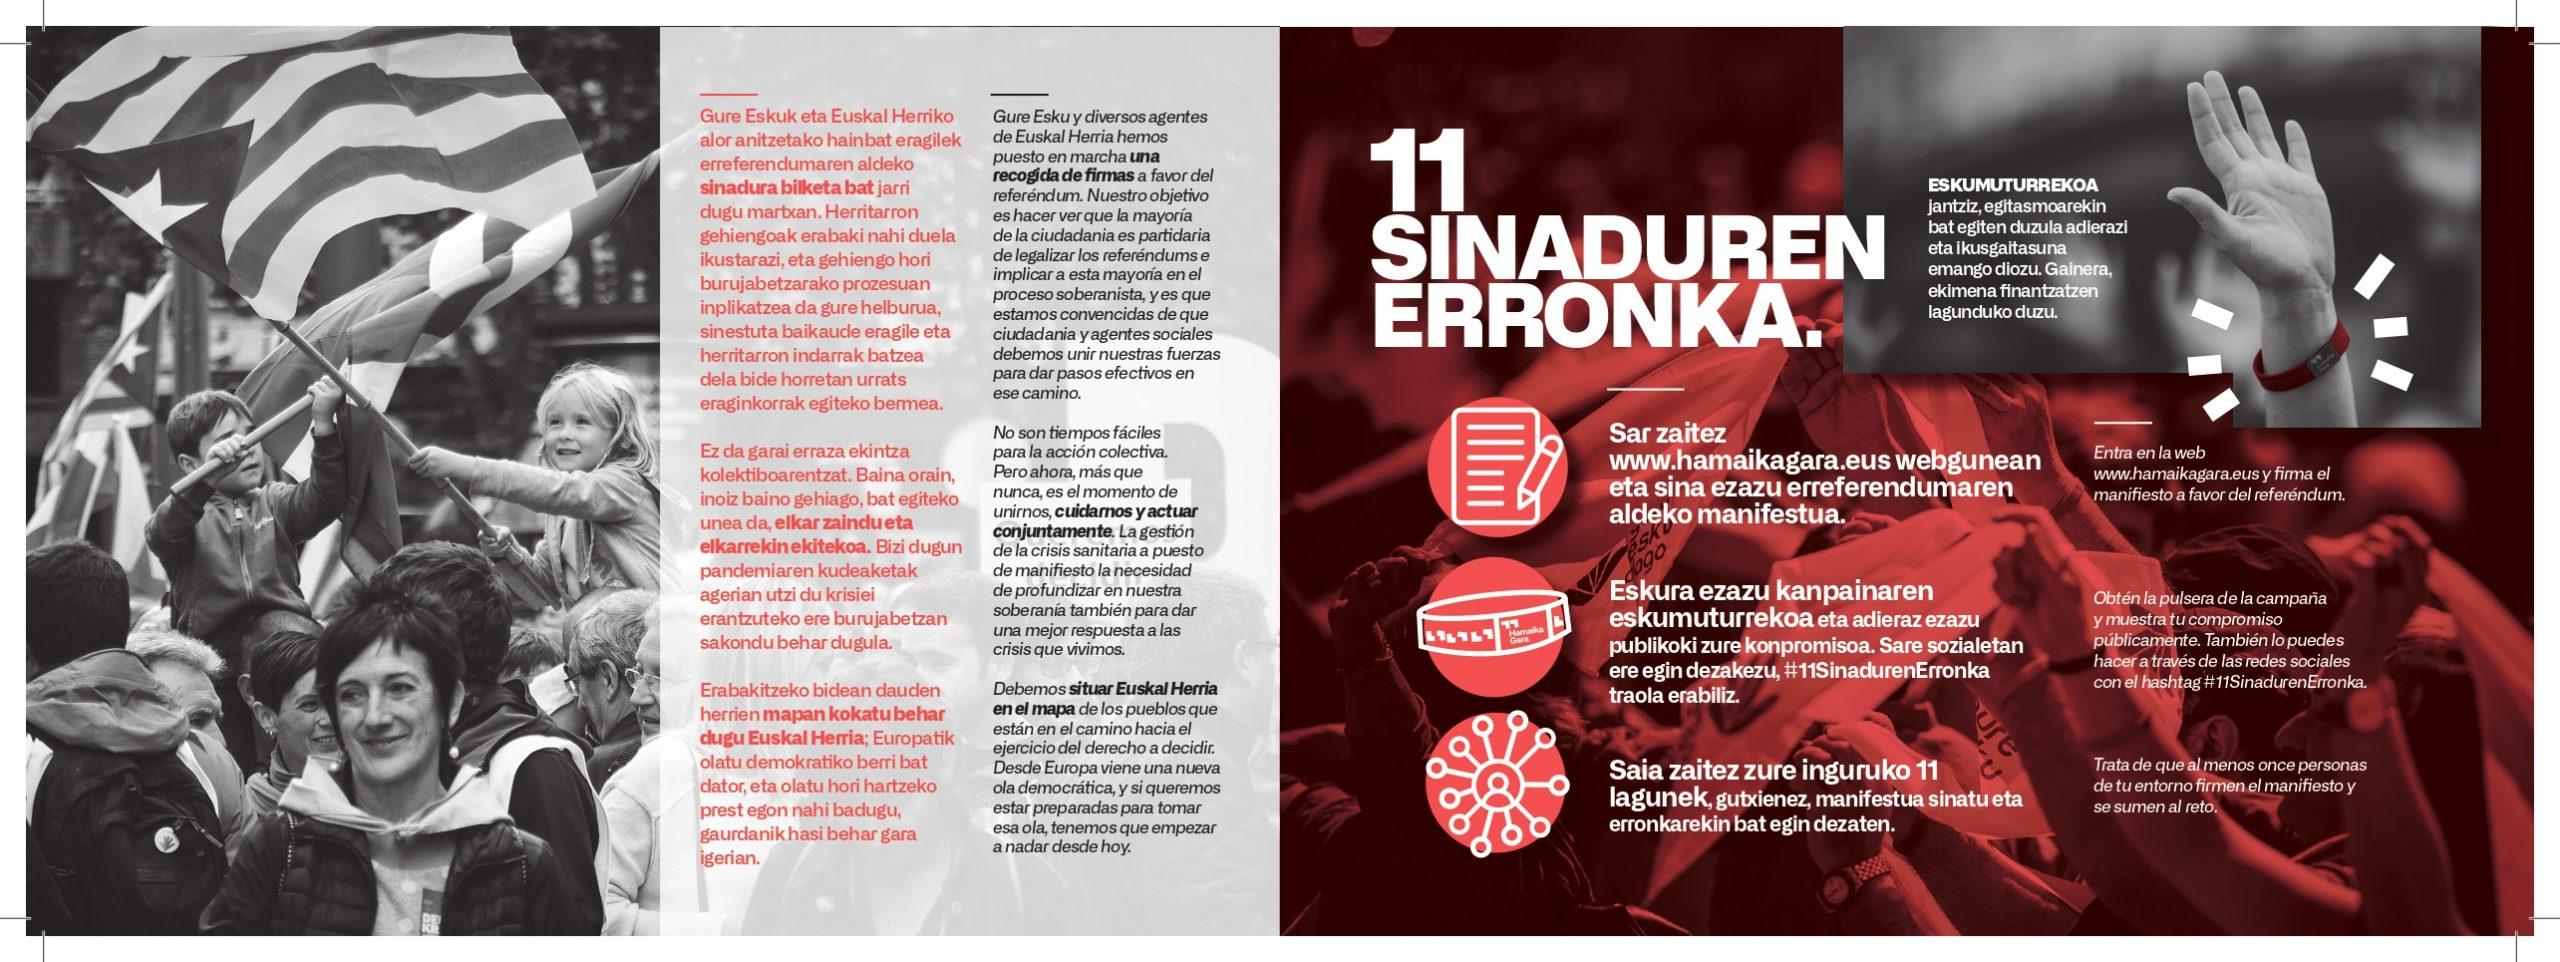 Diptiko etzana A5_page-0002